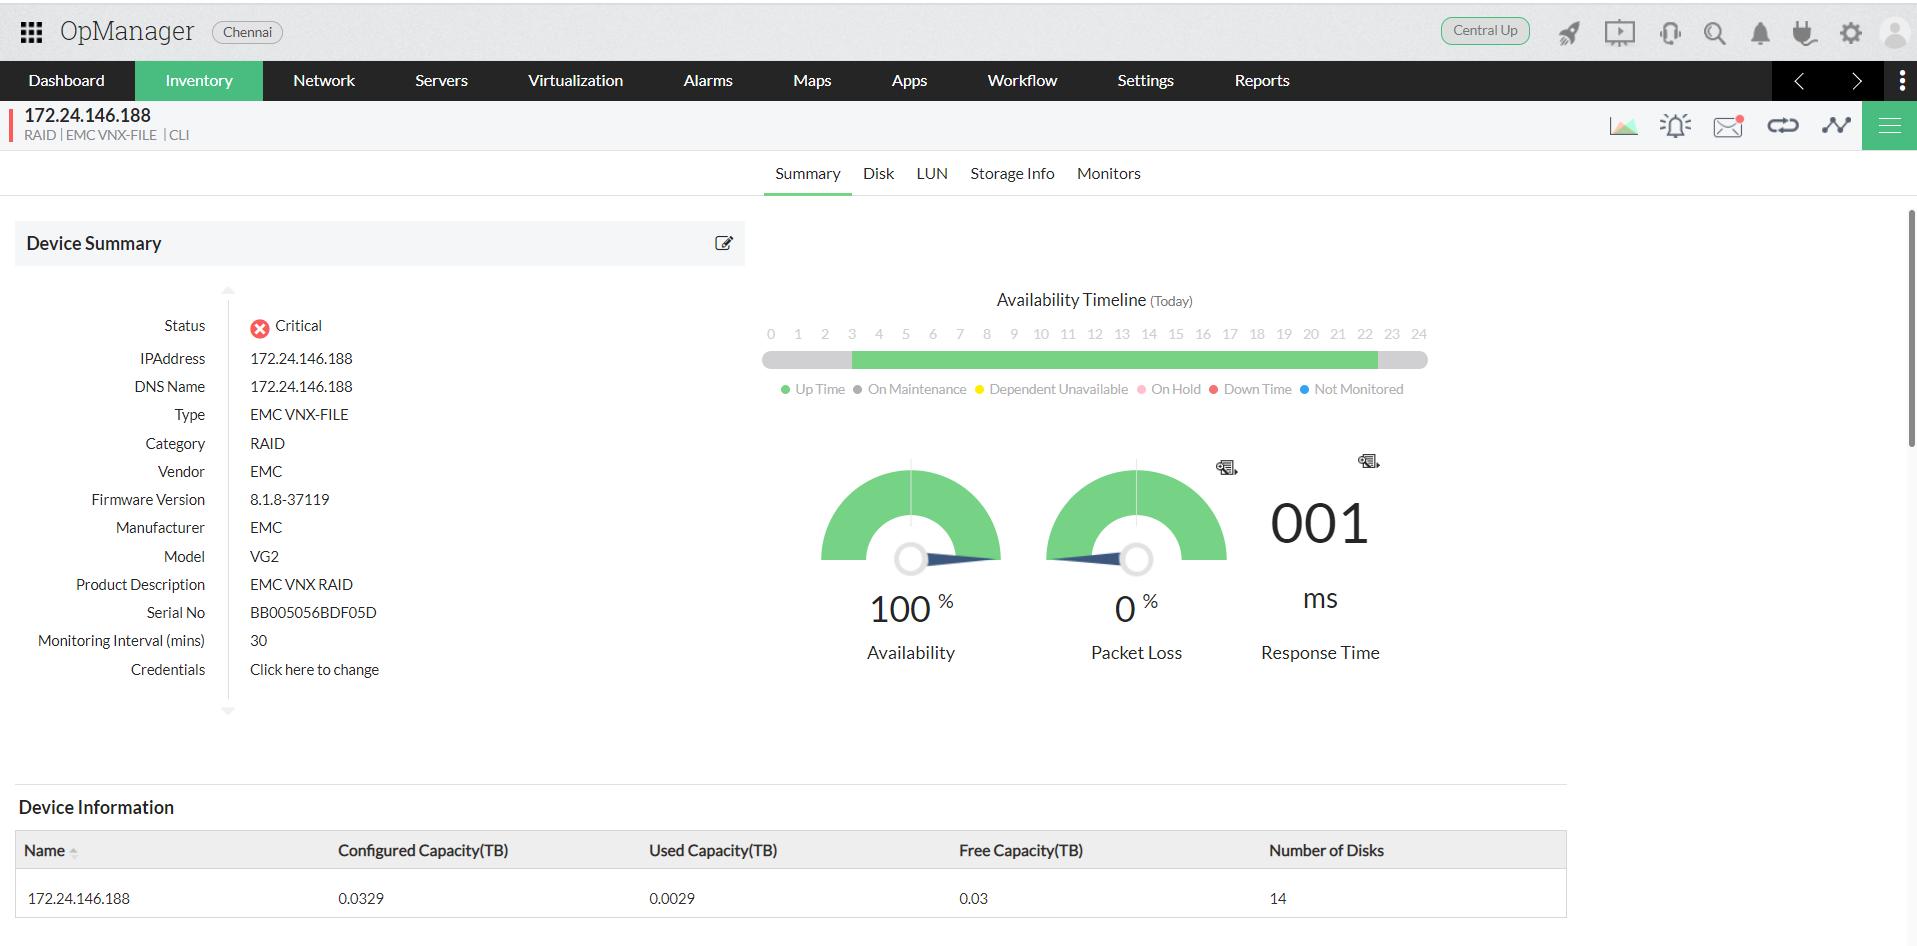 Software de supervisión SAN - ManageEngine OpManager